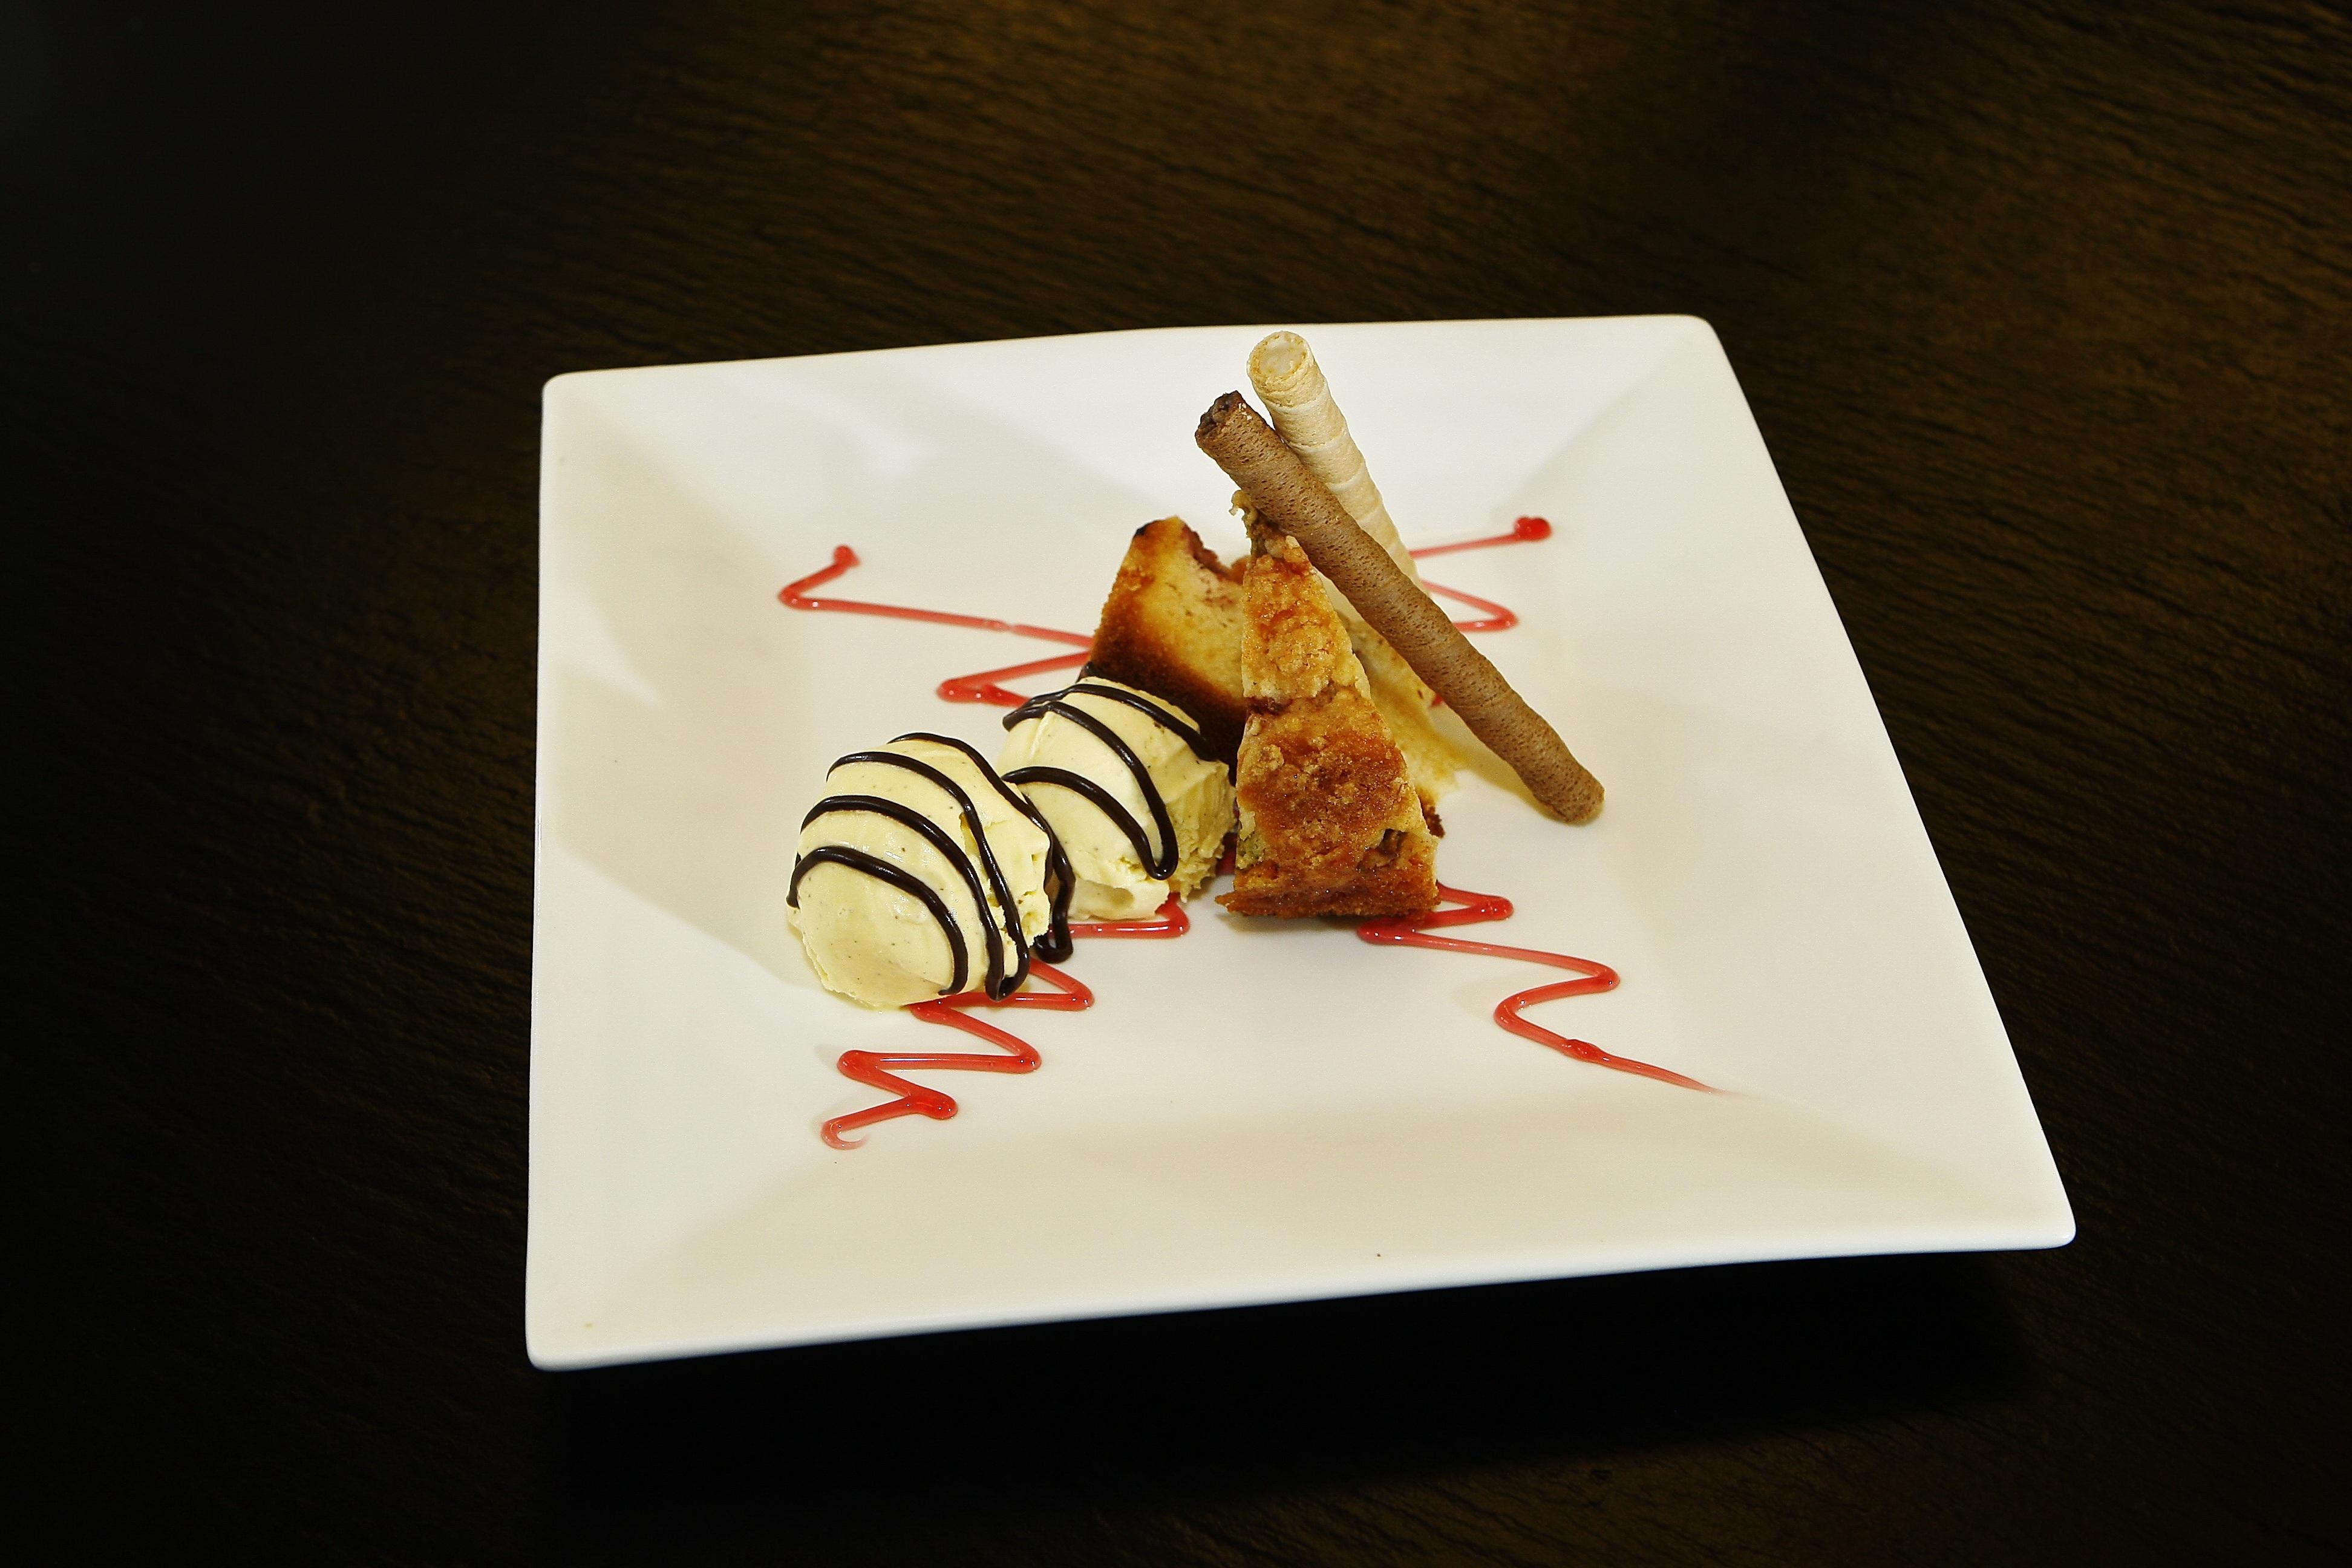 Free Images Sweet Food Chocolate Ice Cream Dessert Art